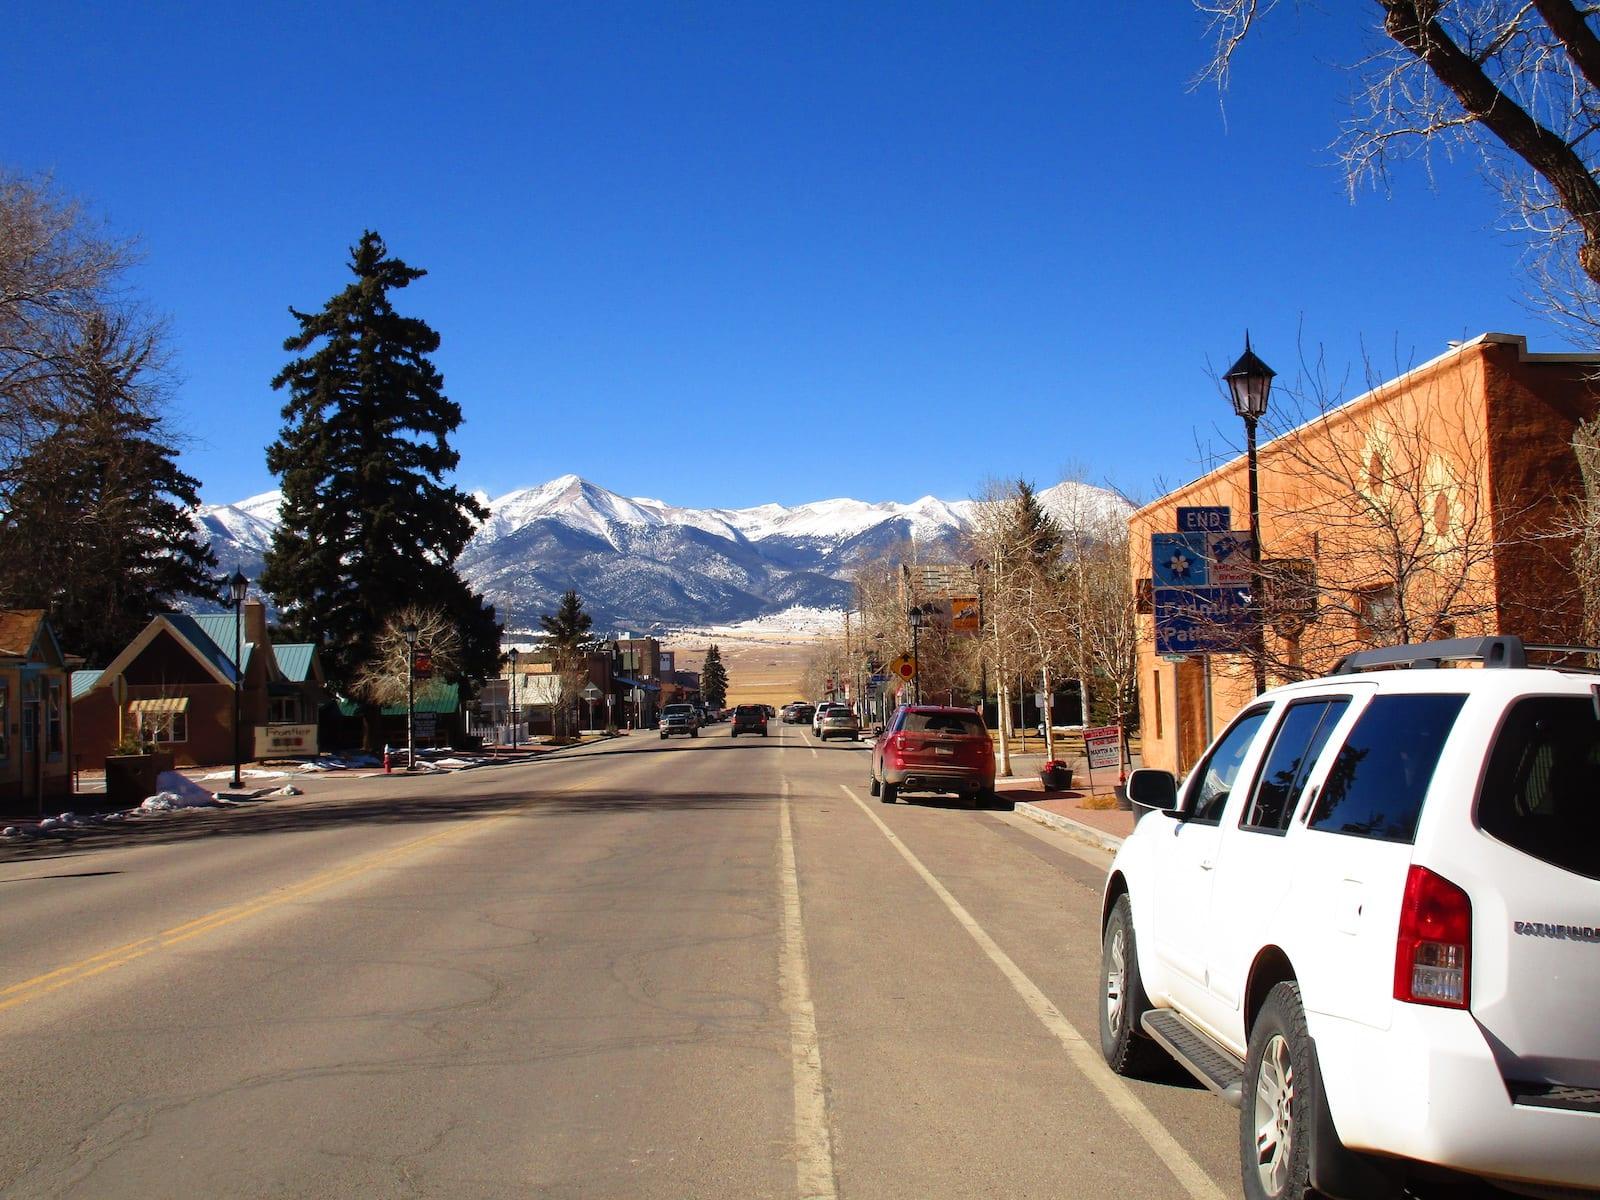 Downtown Westcliffe Colorado